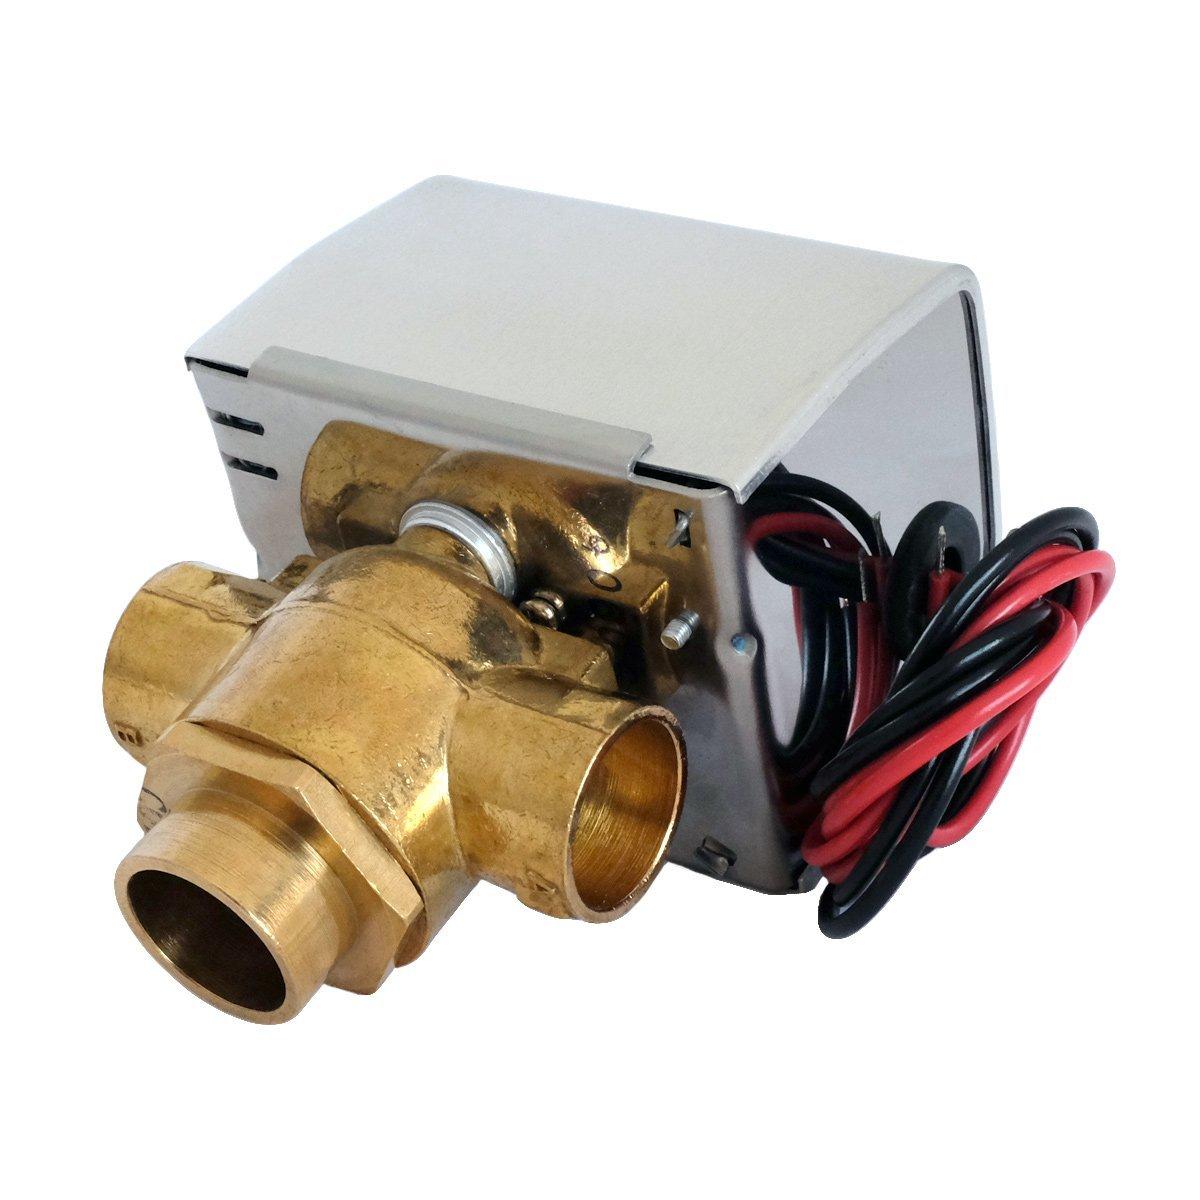 Valemo V3313-A1S Motorized Zone Valve, 3-way 3/4'', Sweat, 24 VAC with End Switch by Valemo Controls (Image #2)